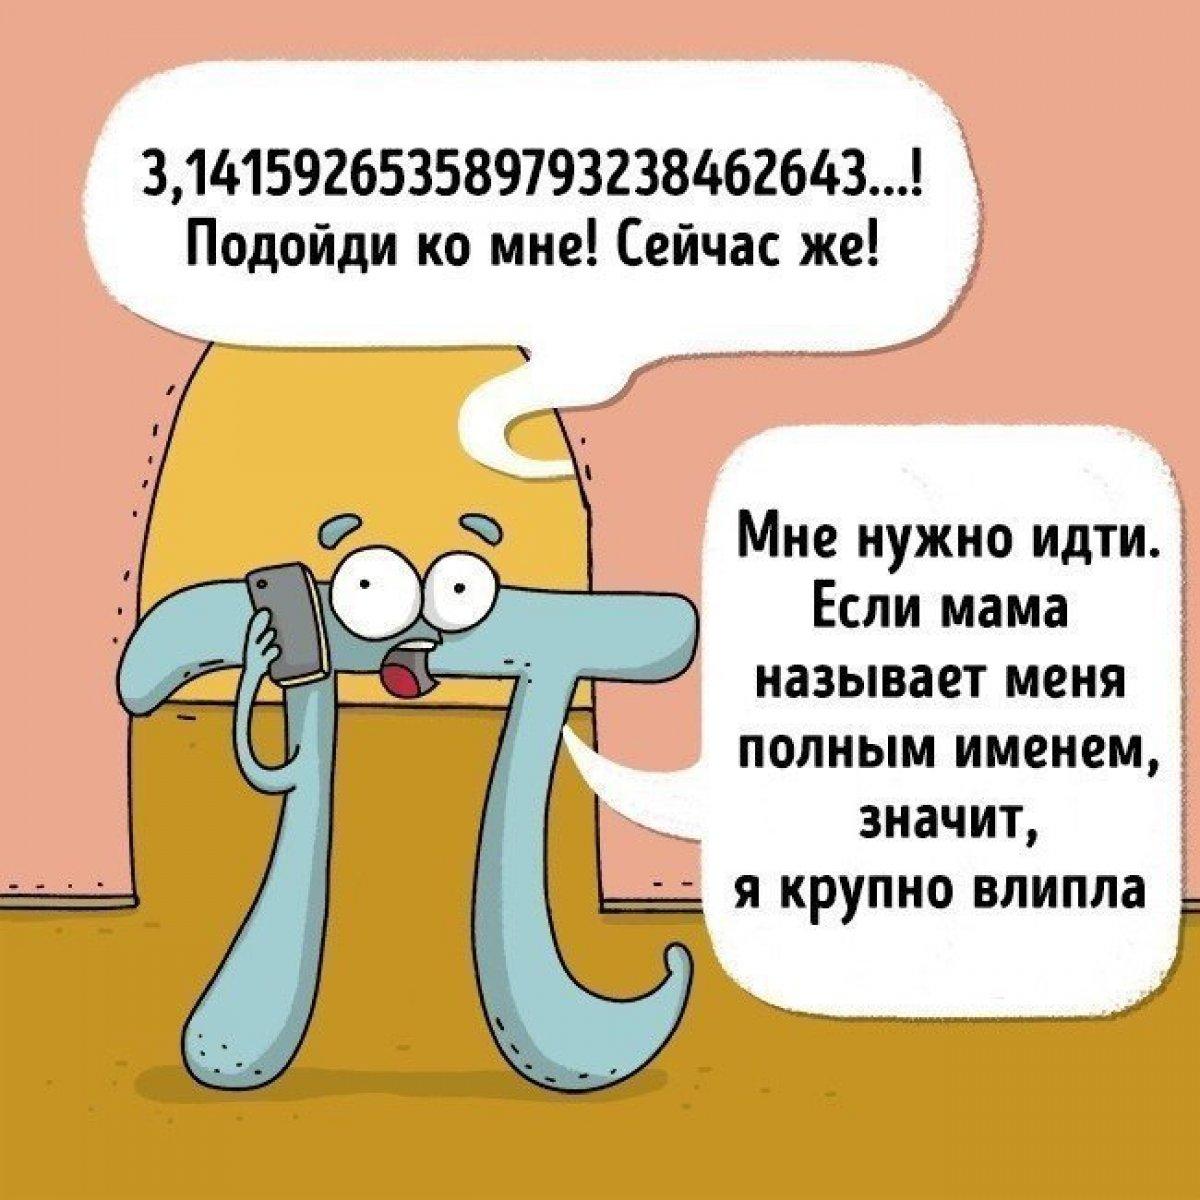 Физика в картинках с юмором